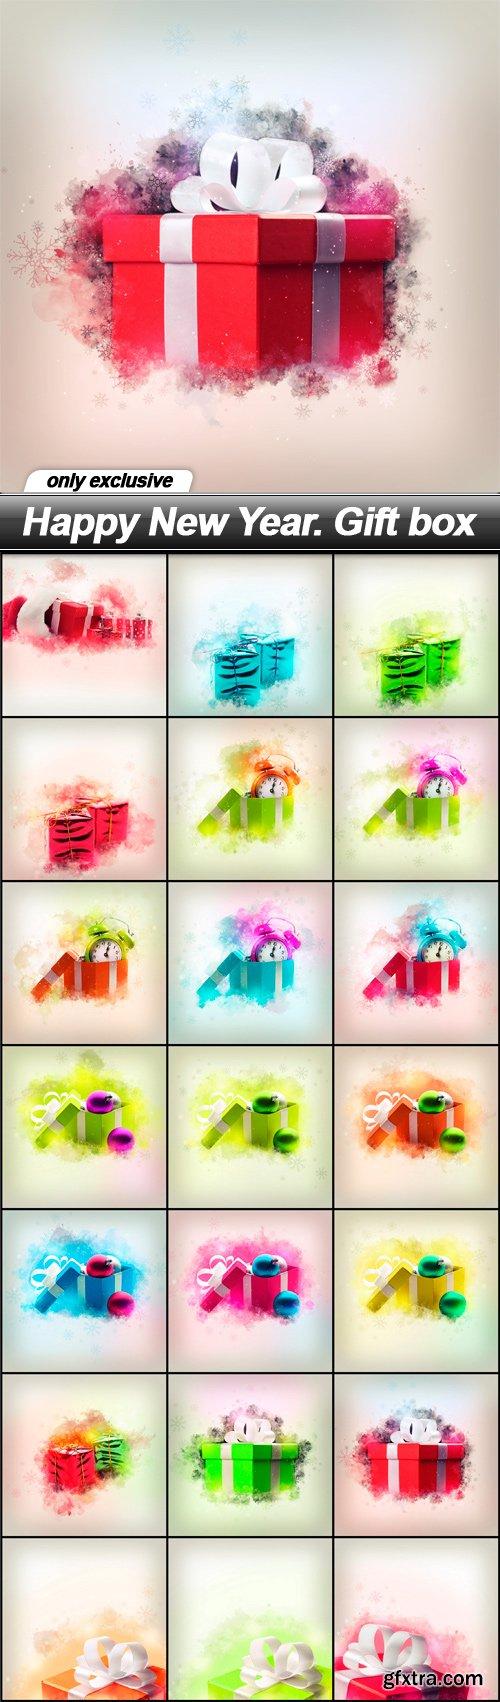 Happy New Year. Gift box - 21 UHQ JPEG